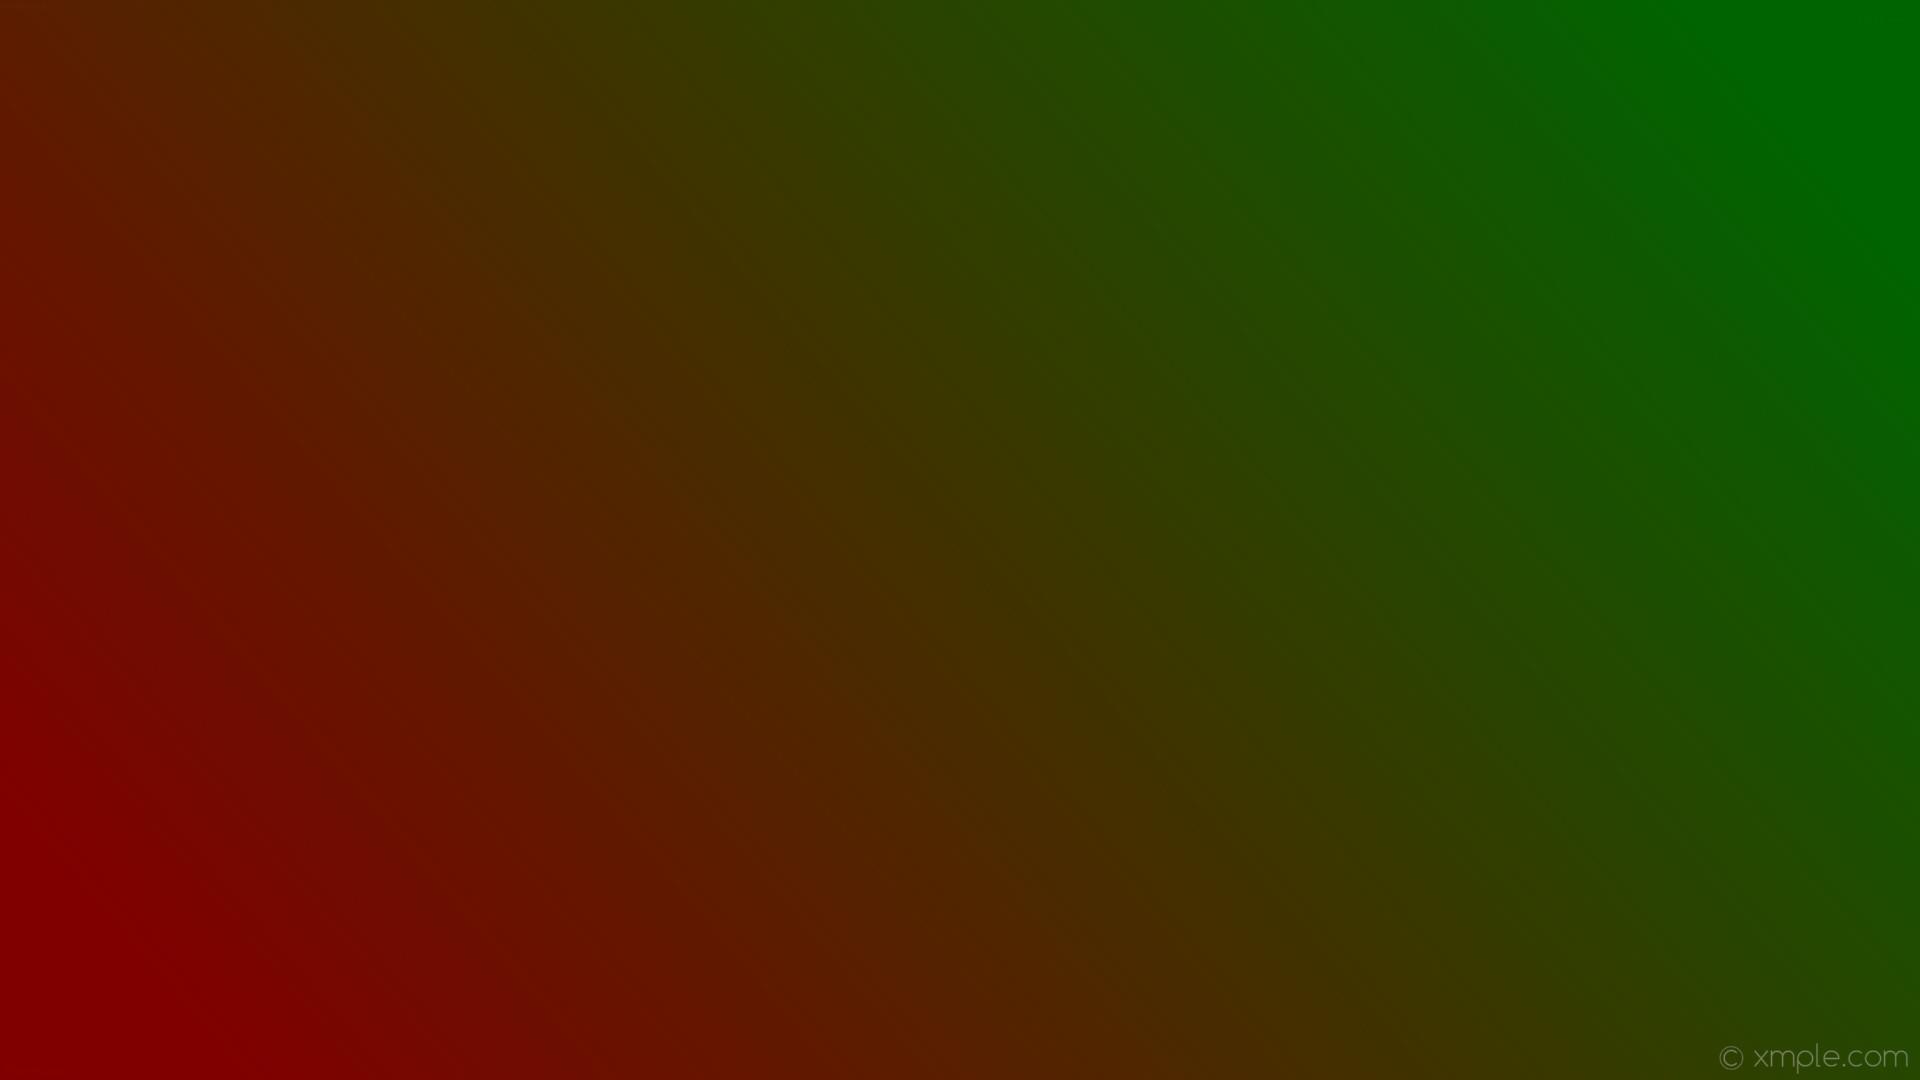 wallpaper gradient brown green linear maroon dark green #800000 #006400 195°